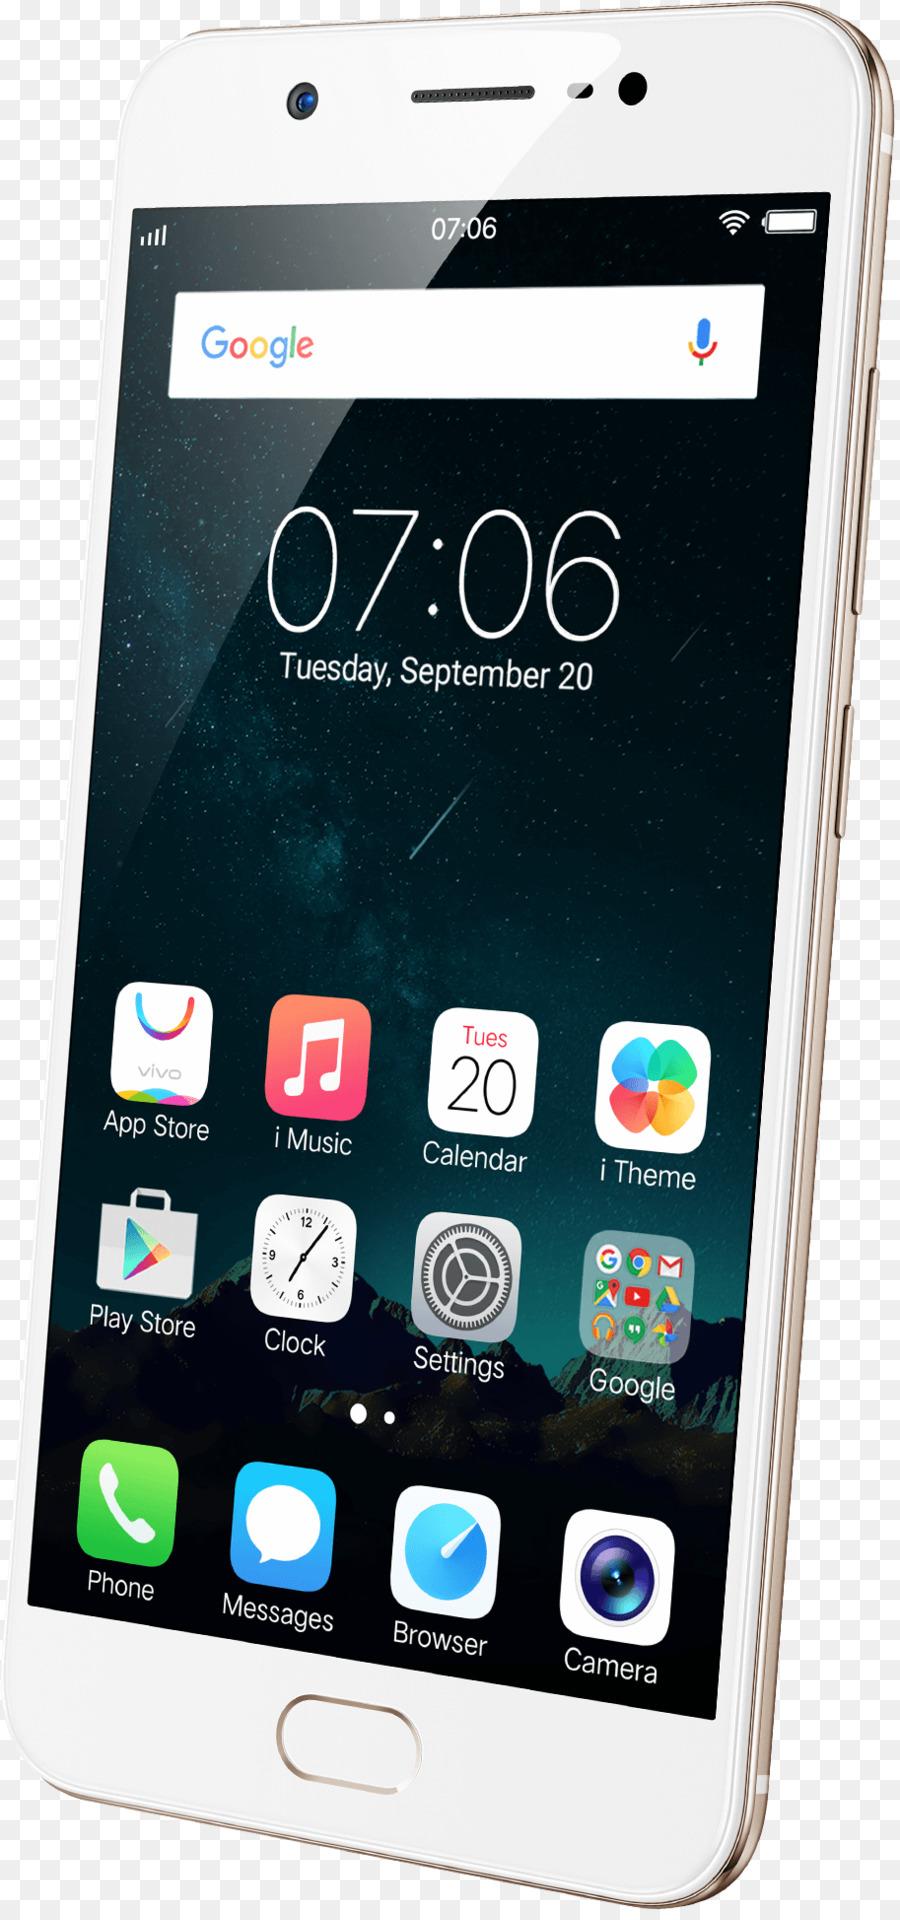 Vivo Y69 Mobile Phone png download - 913*1941 - Free Transparent